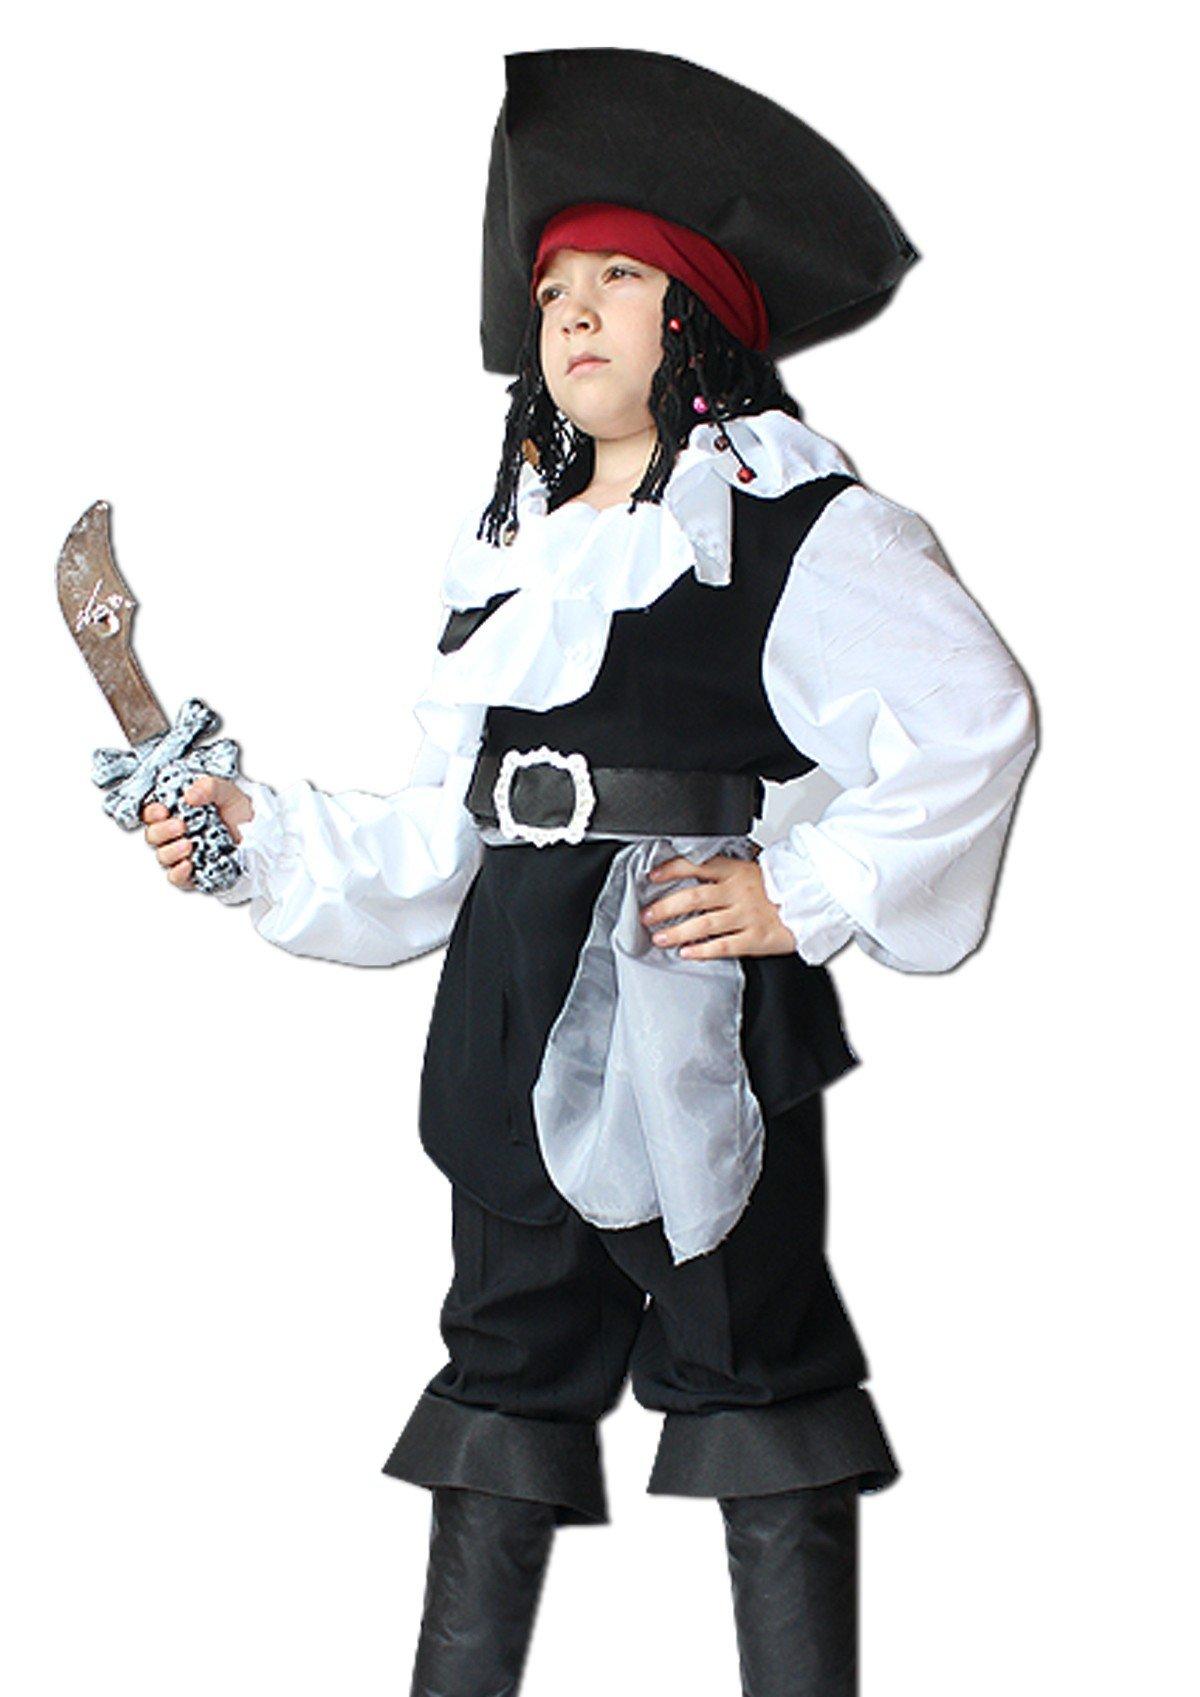 Новогодний костюм разбойника для мальчика своими руками